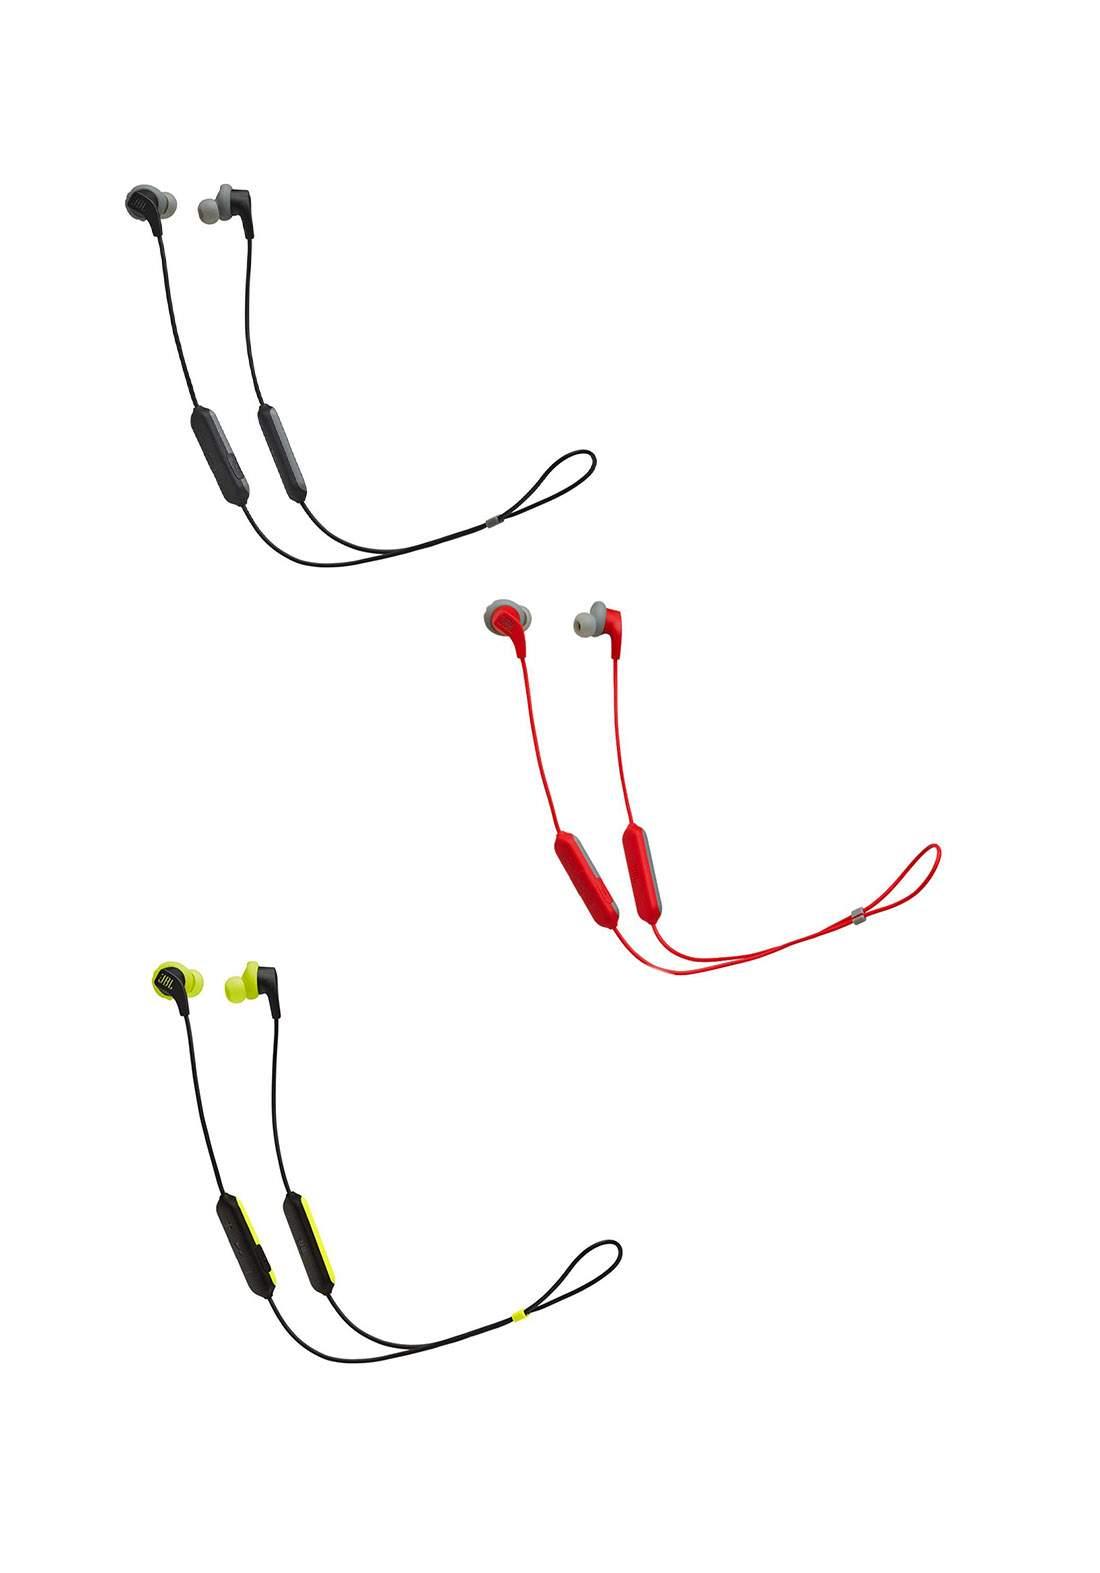 JBL Endurance RunBT Sweatproof Wireless  Earphones سماعة لا سلكية